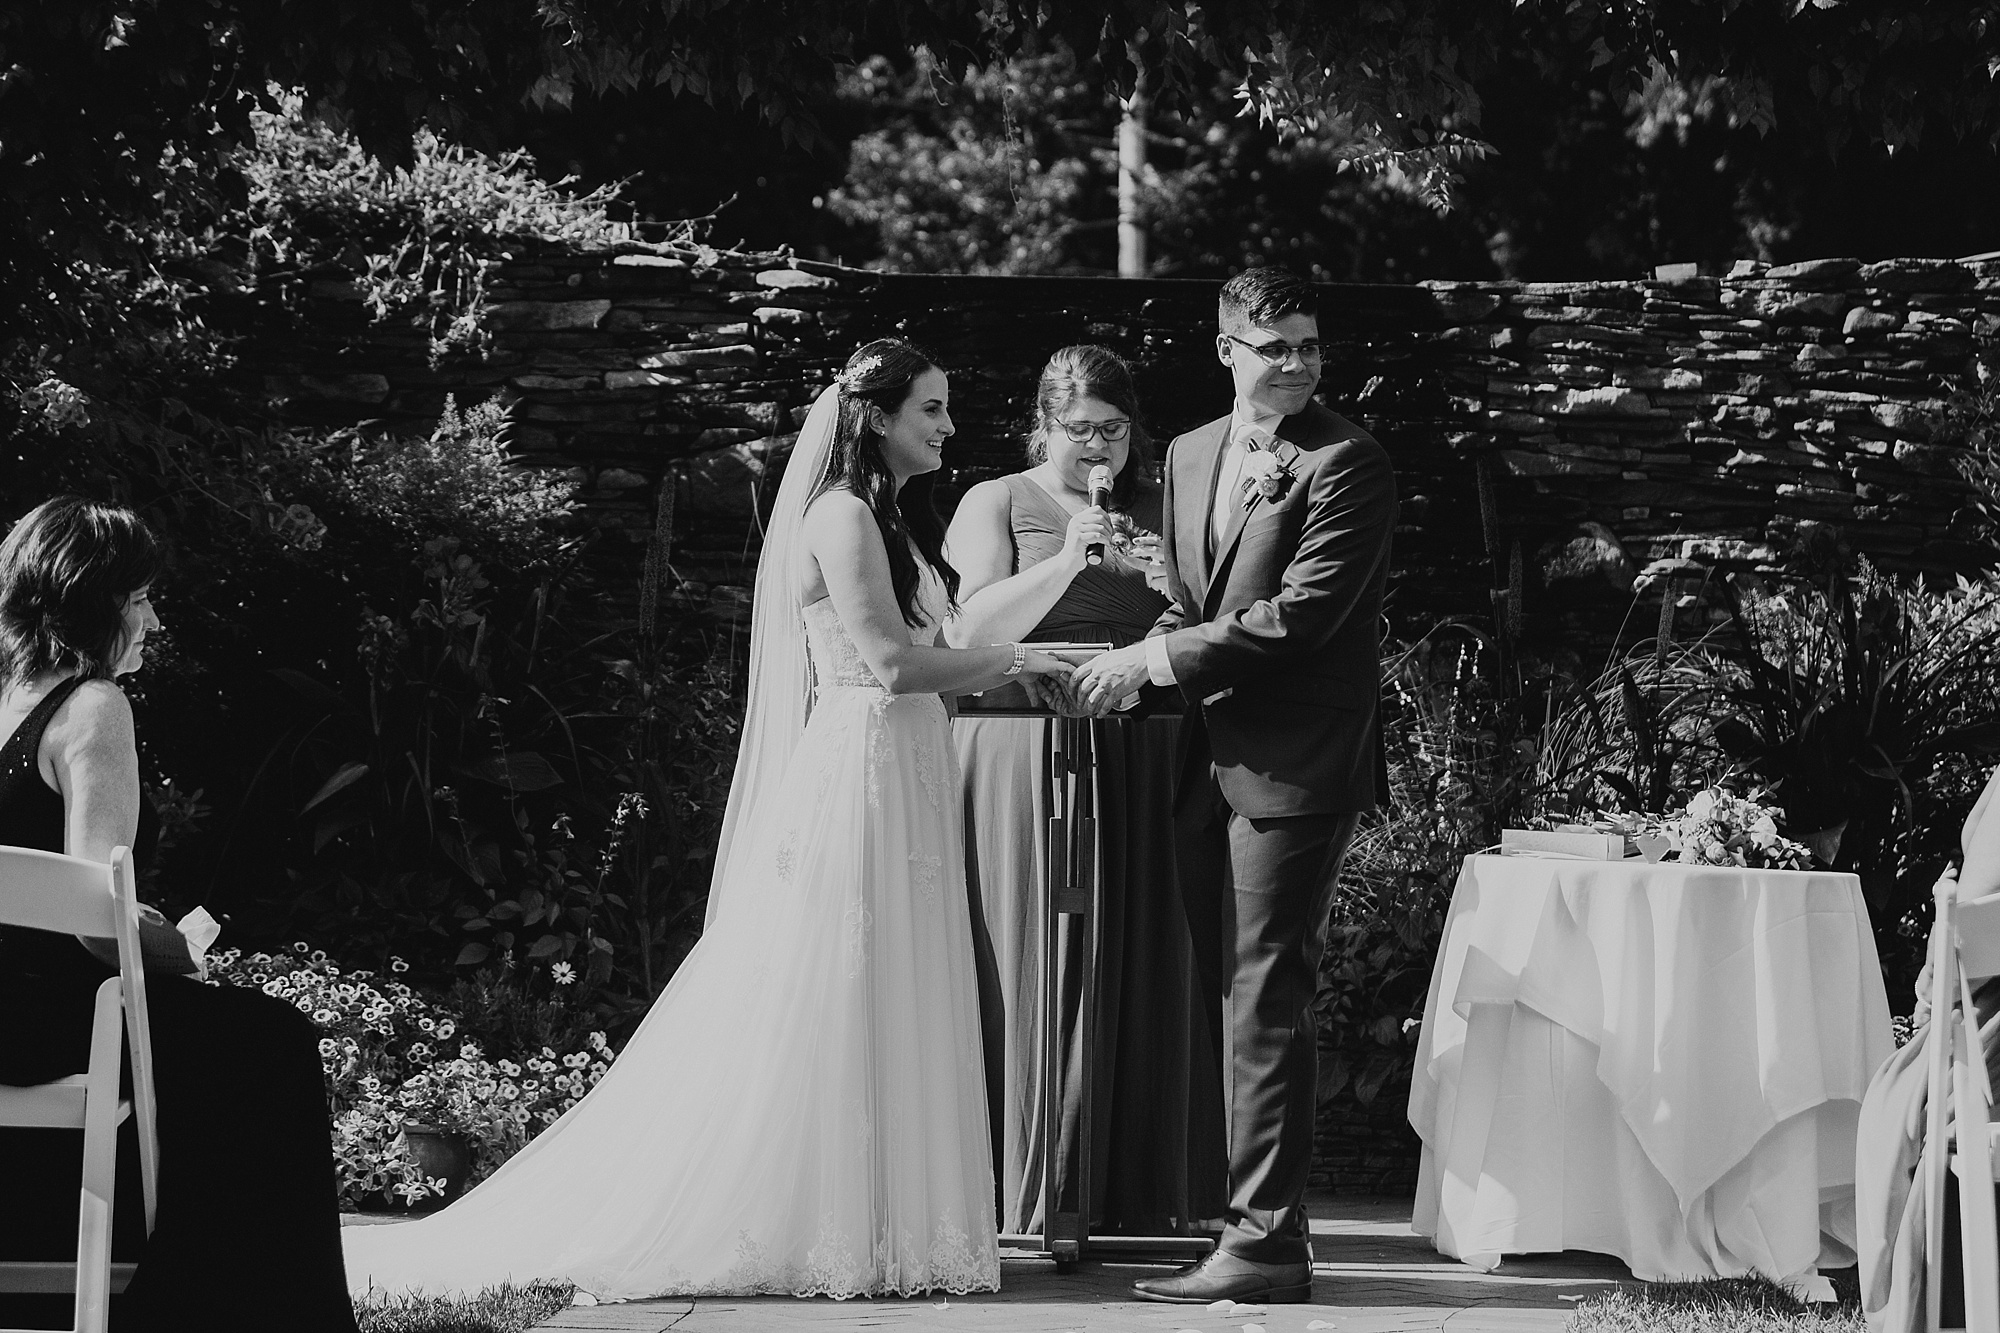 Love_by_Joe_Mac_Nicole_Patrick_Gables_At_Chadds_Ford_Wedding_Photography_Best_Philadelphia__0070.jpg